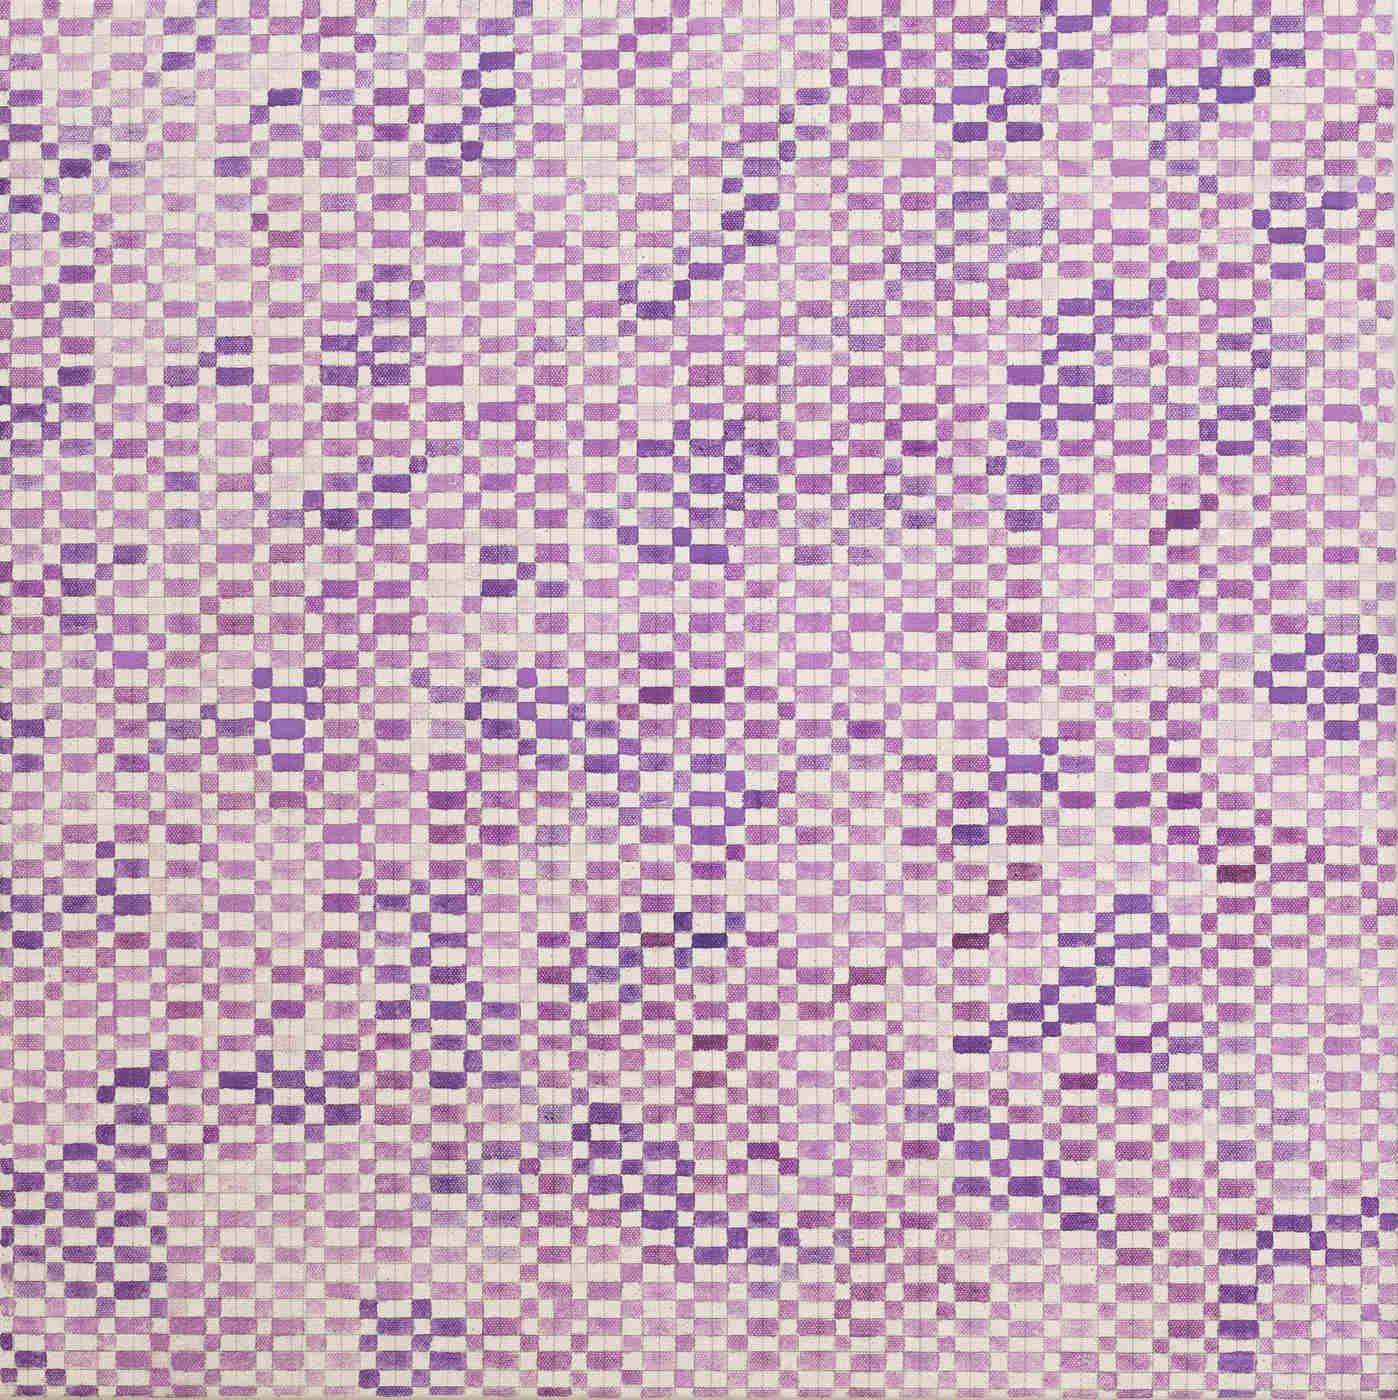 Lavendar Grid